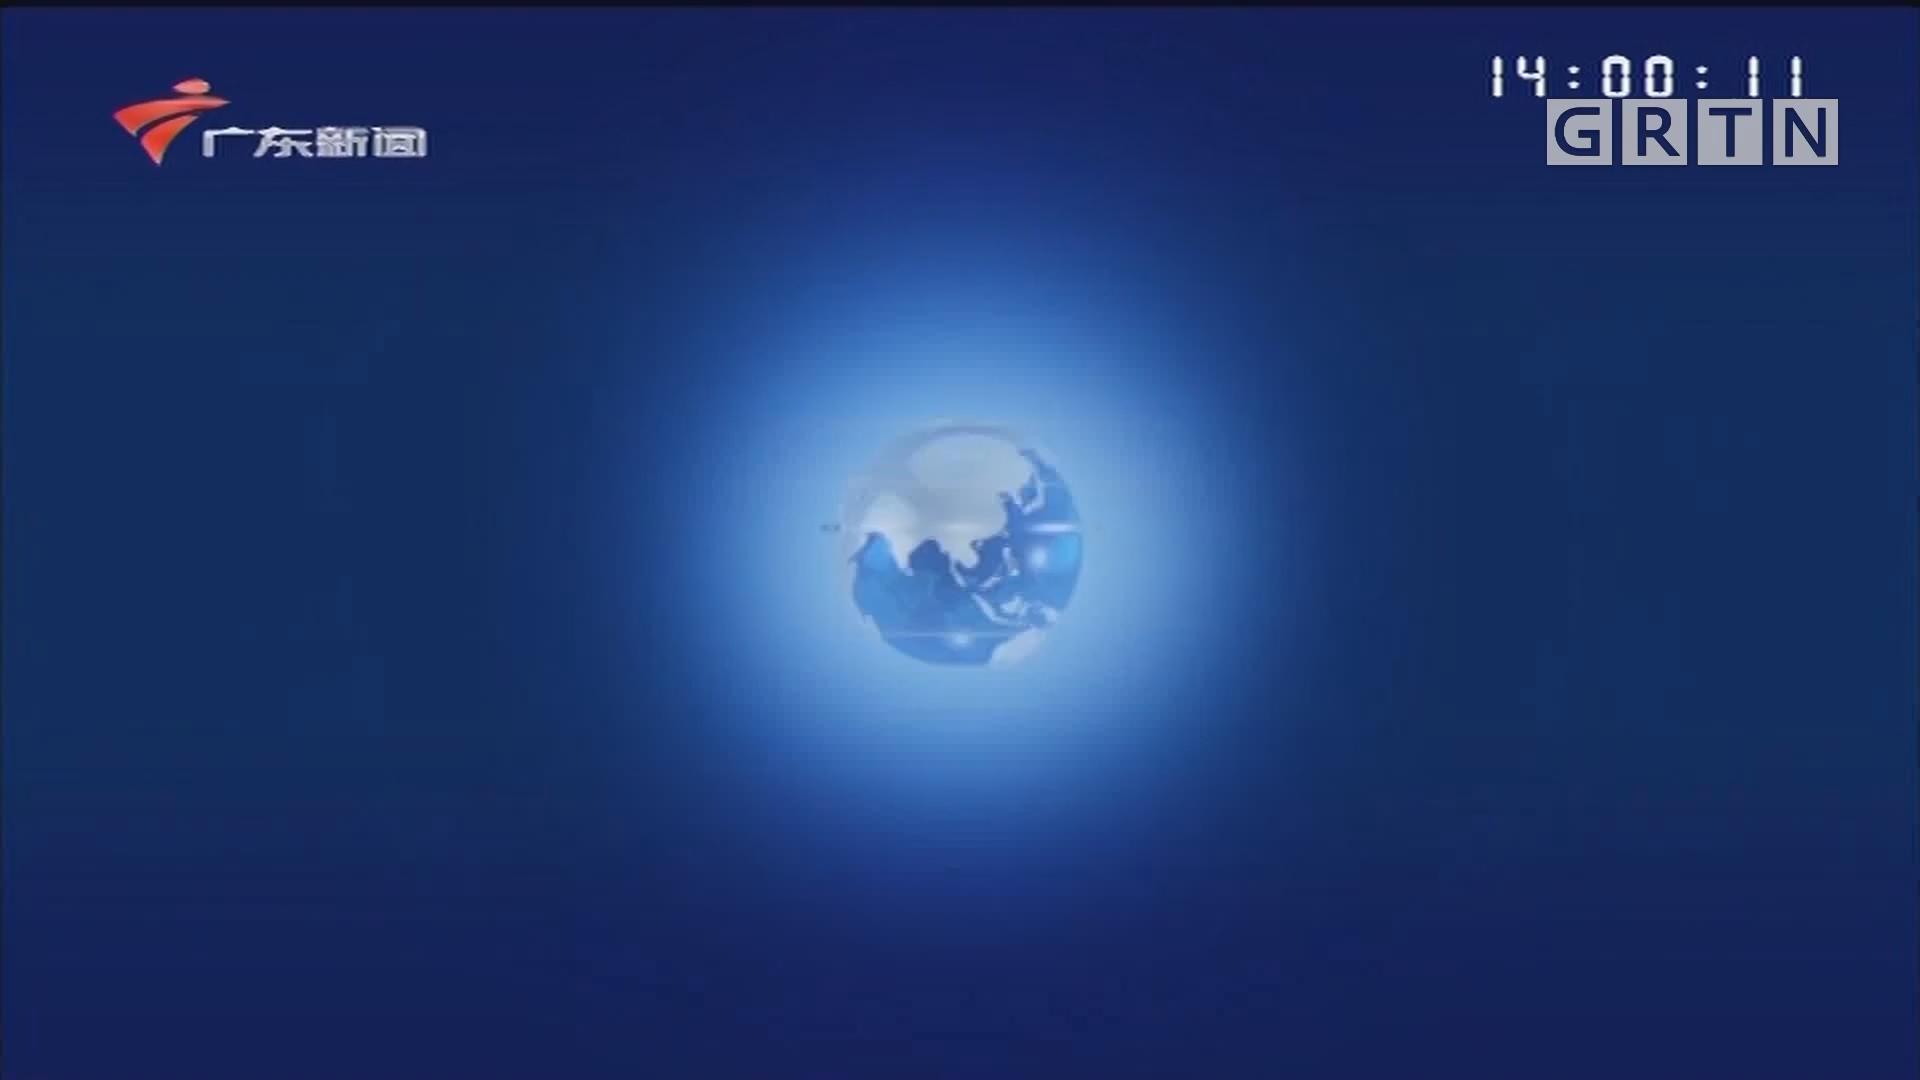 [HD][2020-02-11-14:00]正点播报:广州:交警全力保障交通安全有序